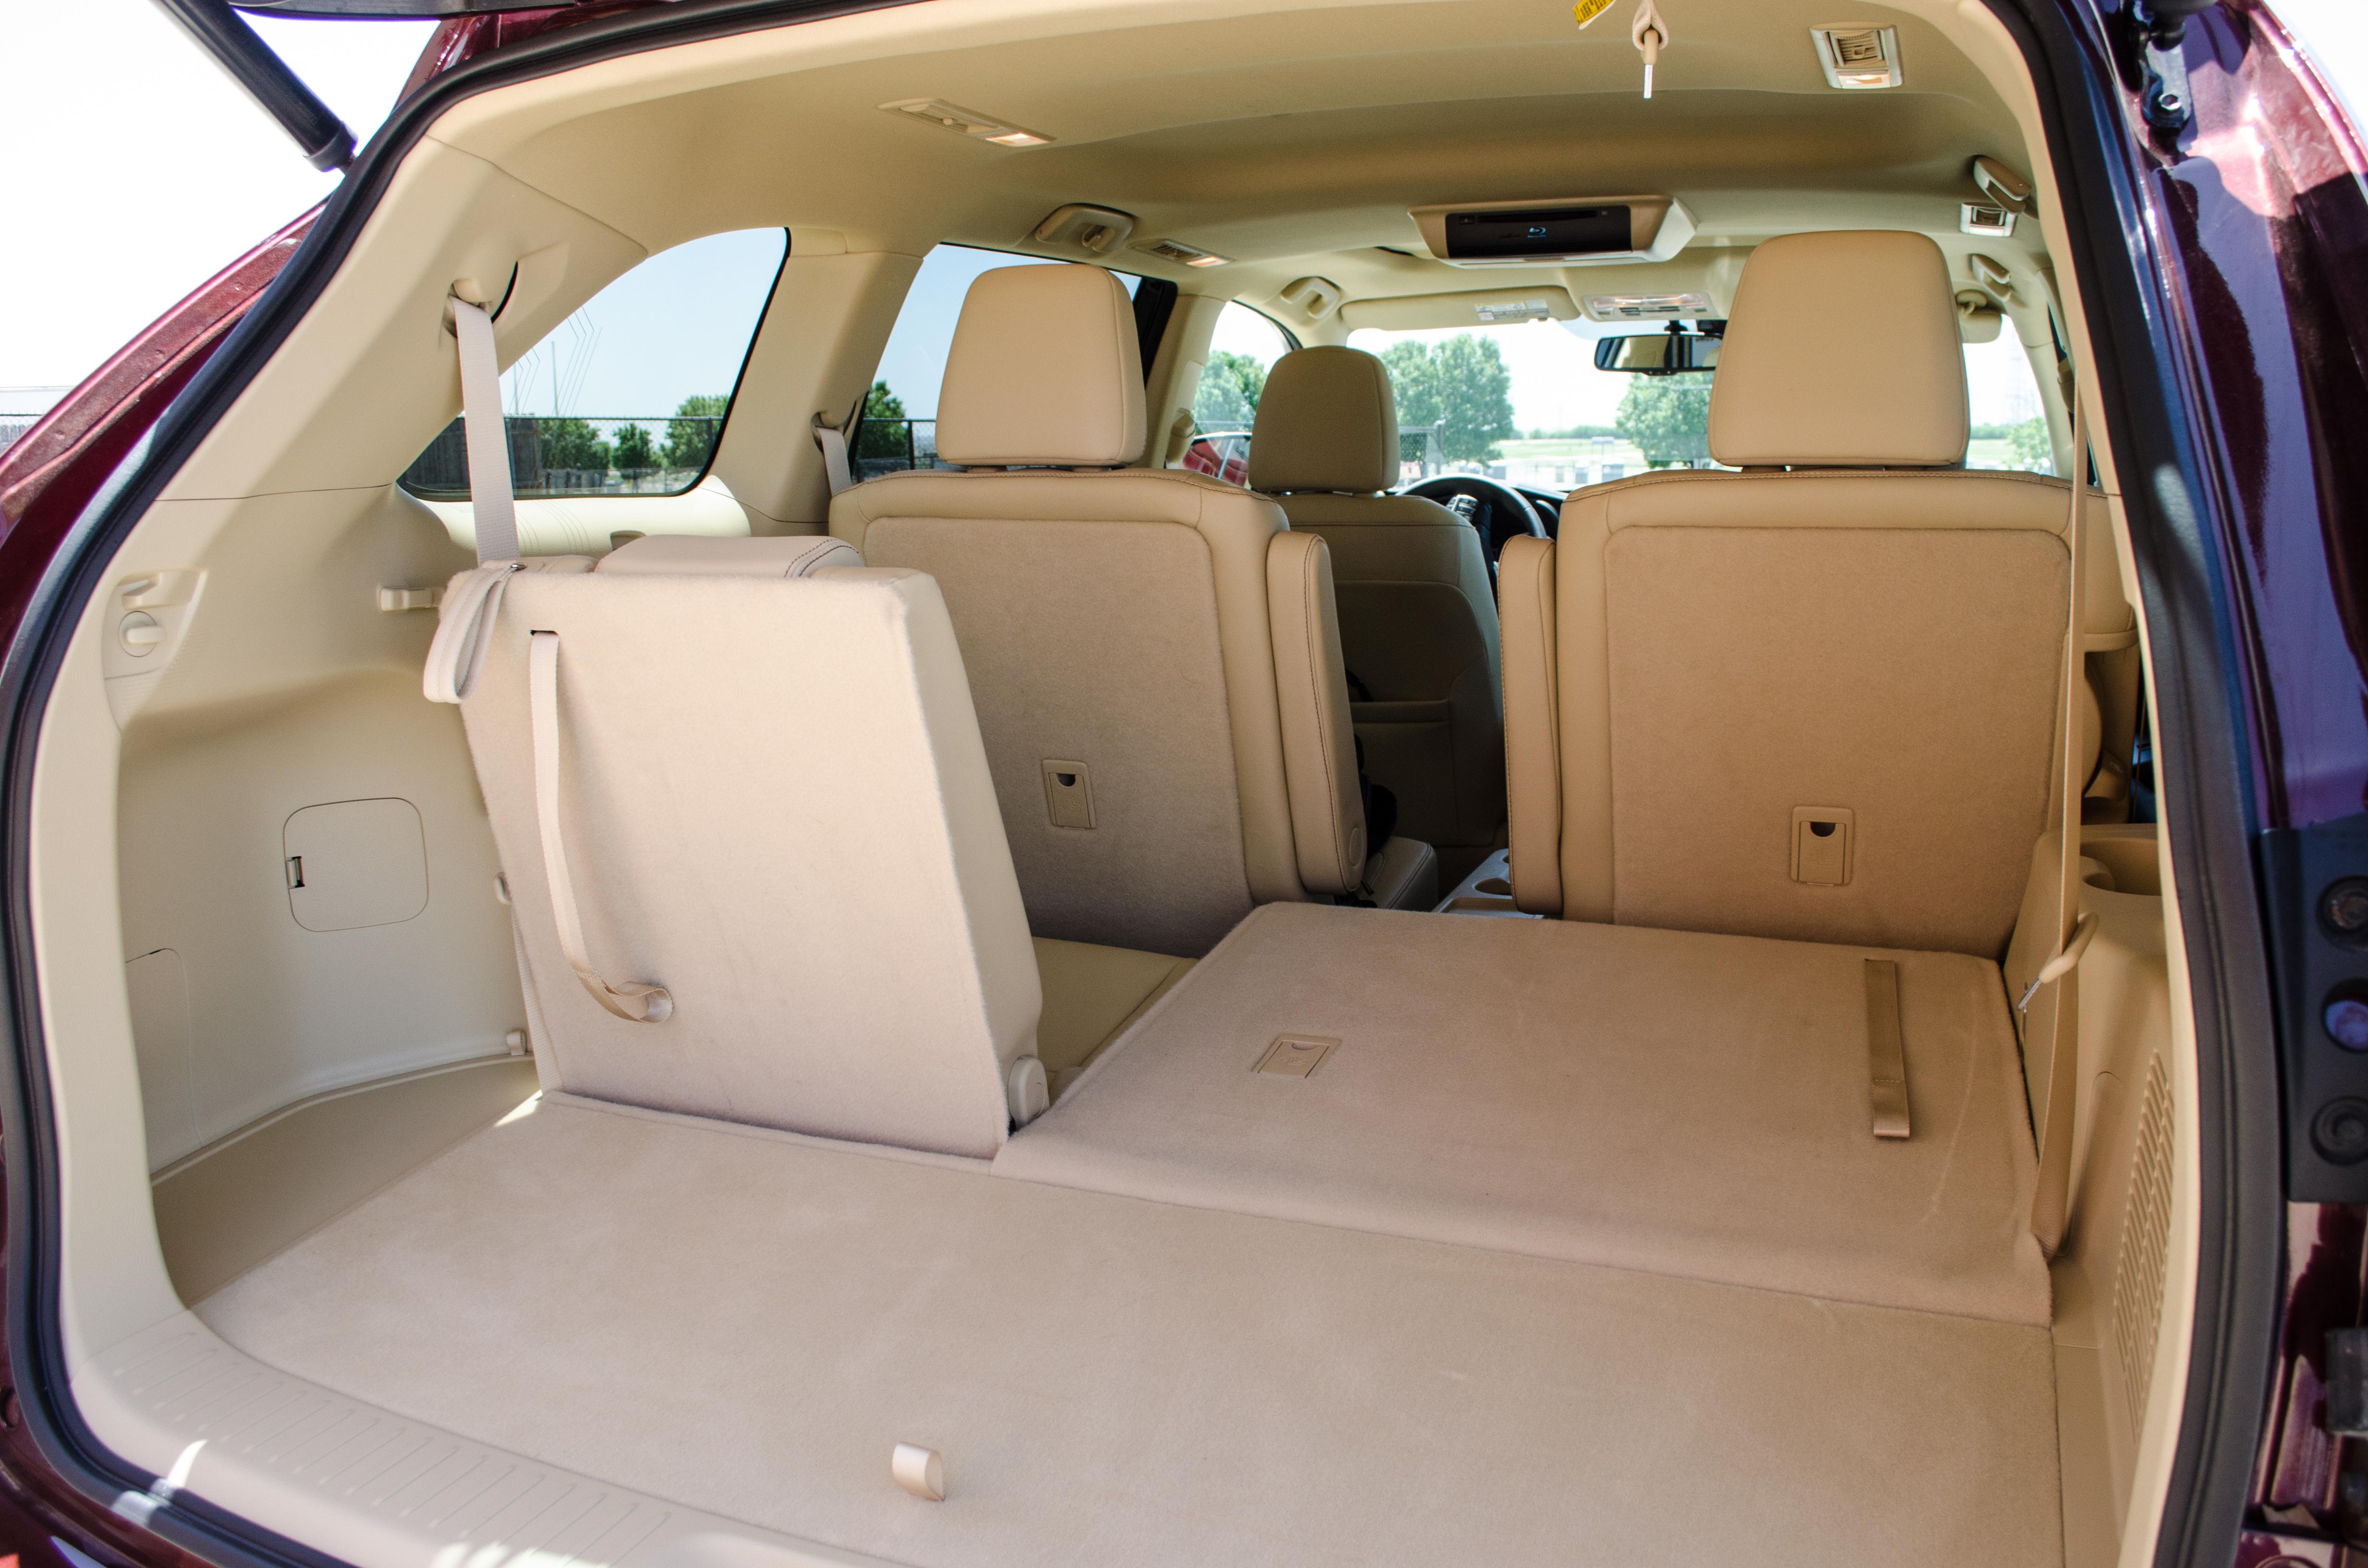 2014 Toyota Highlander Performance And Technology Motor